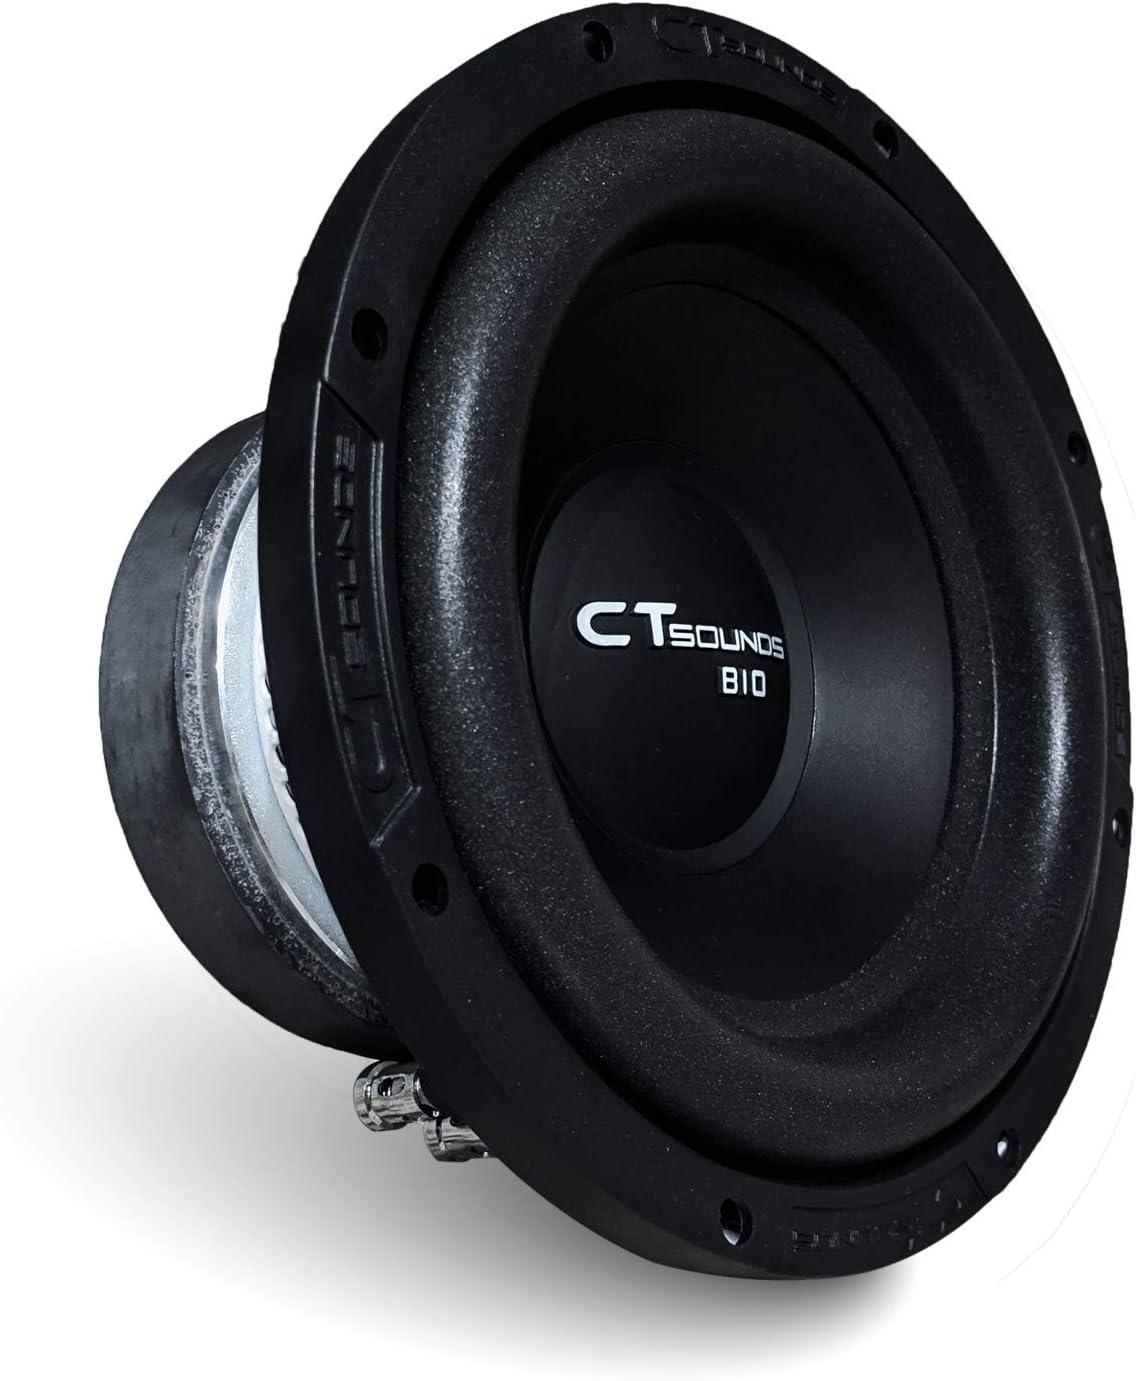 CT SOUNDS 8 inch Car Subwoofer